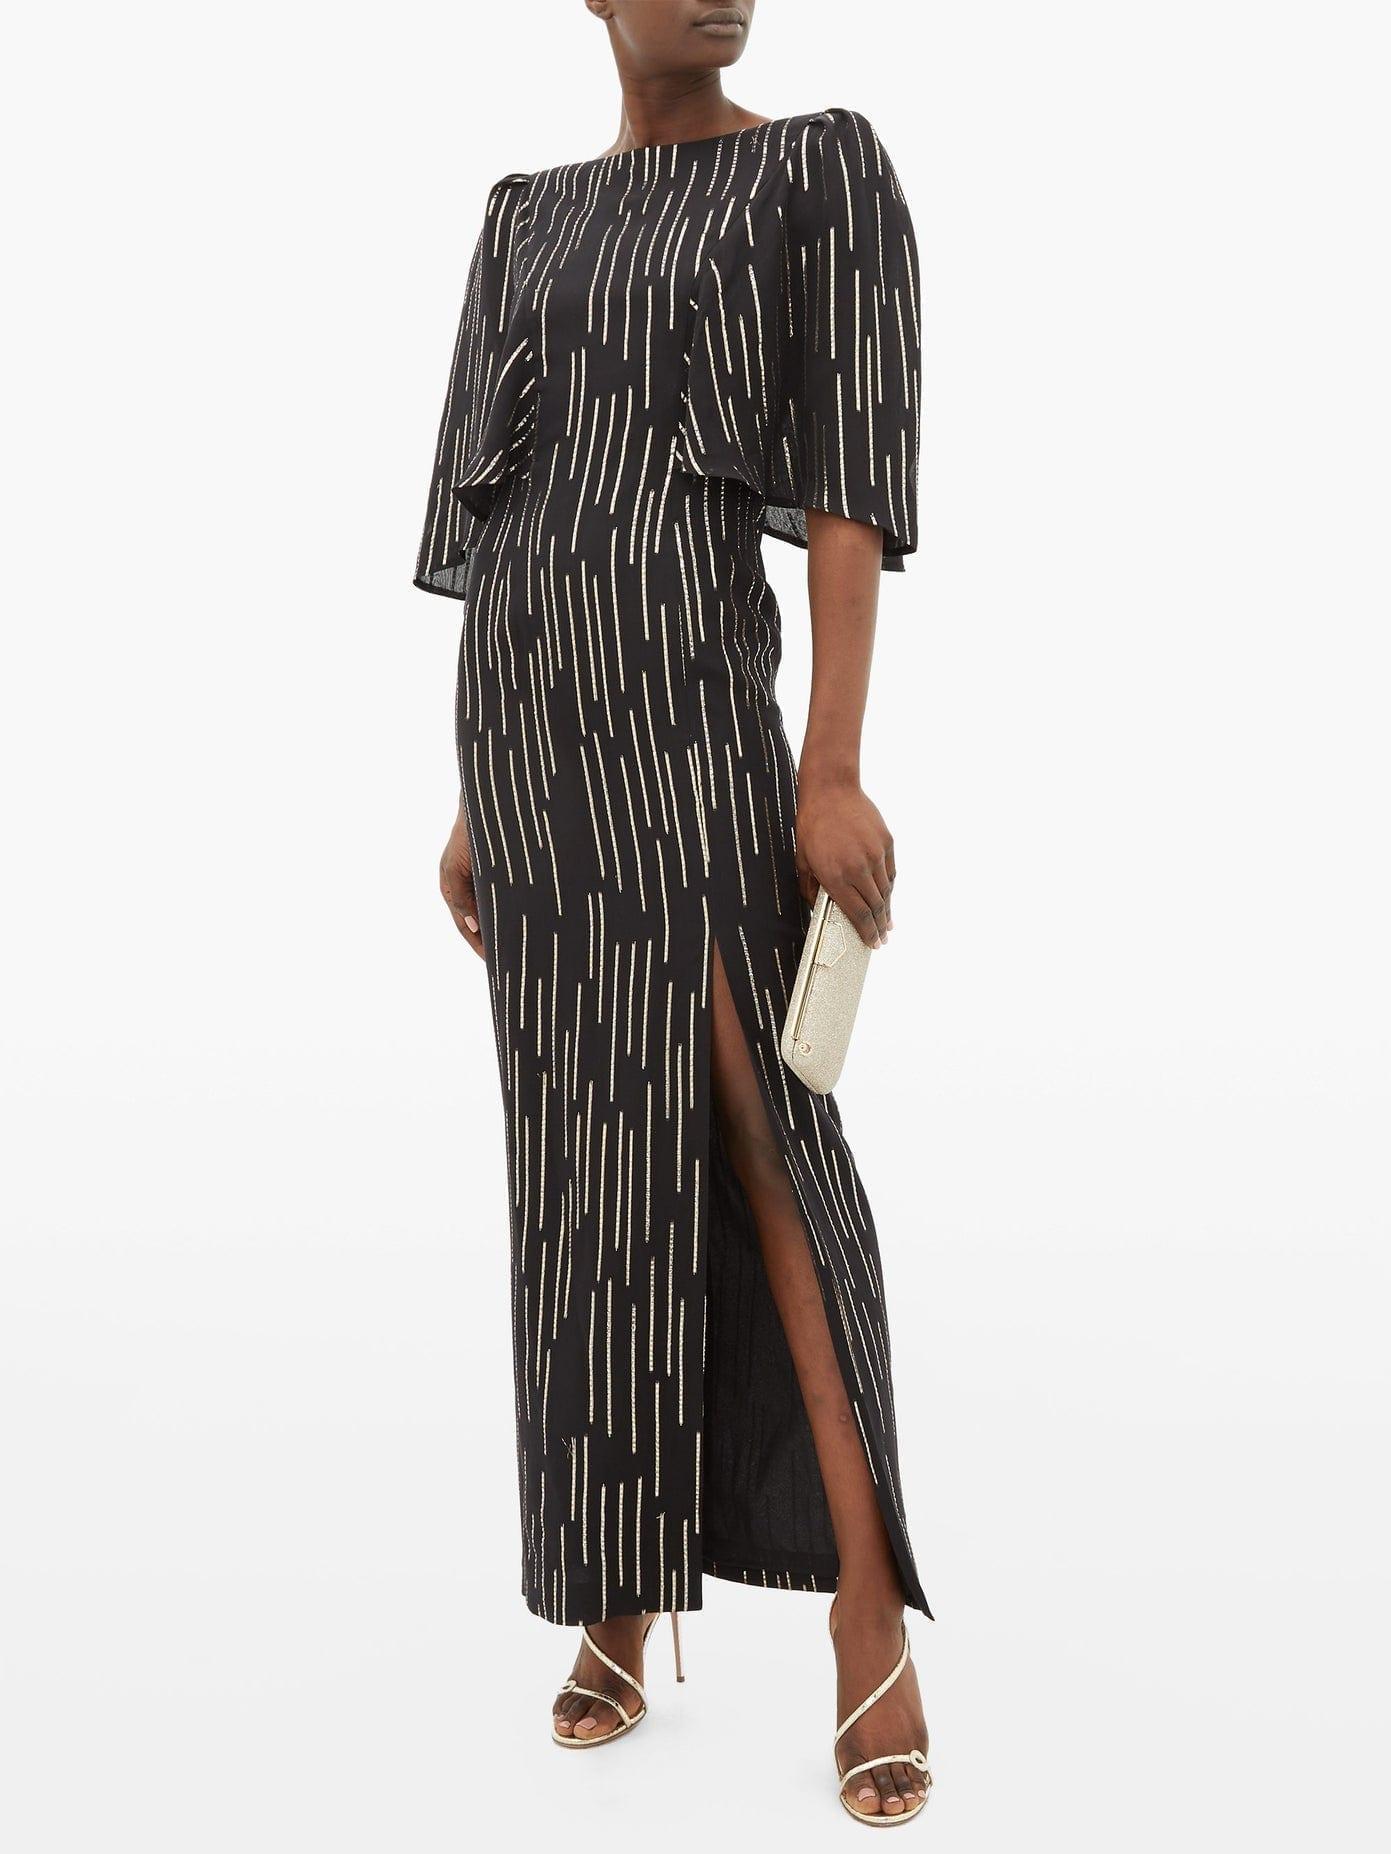 ADRIANA IGLESIAS Taylor Lamé-Striped Silk-Blend Dress